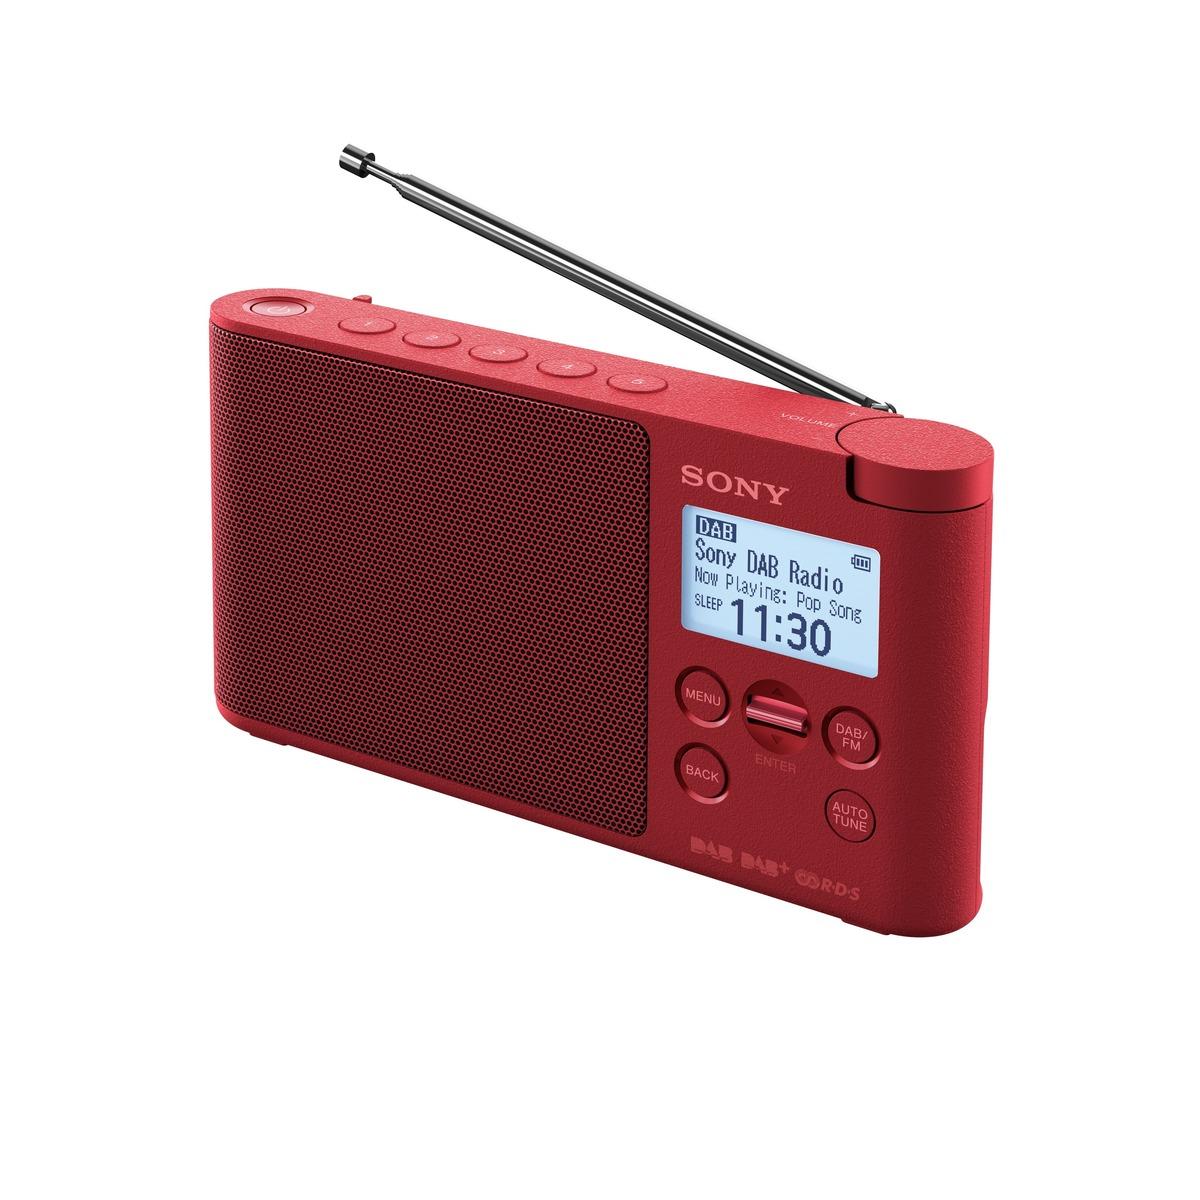 SONY XDRS-41DR Lehké a přenosné DAB/DAB+/FM rádio Red